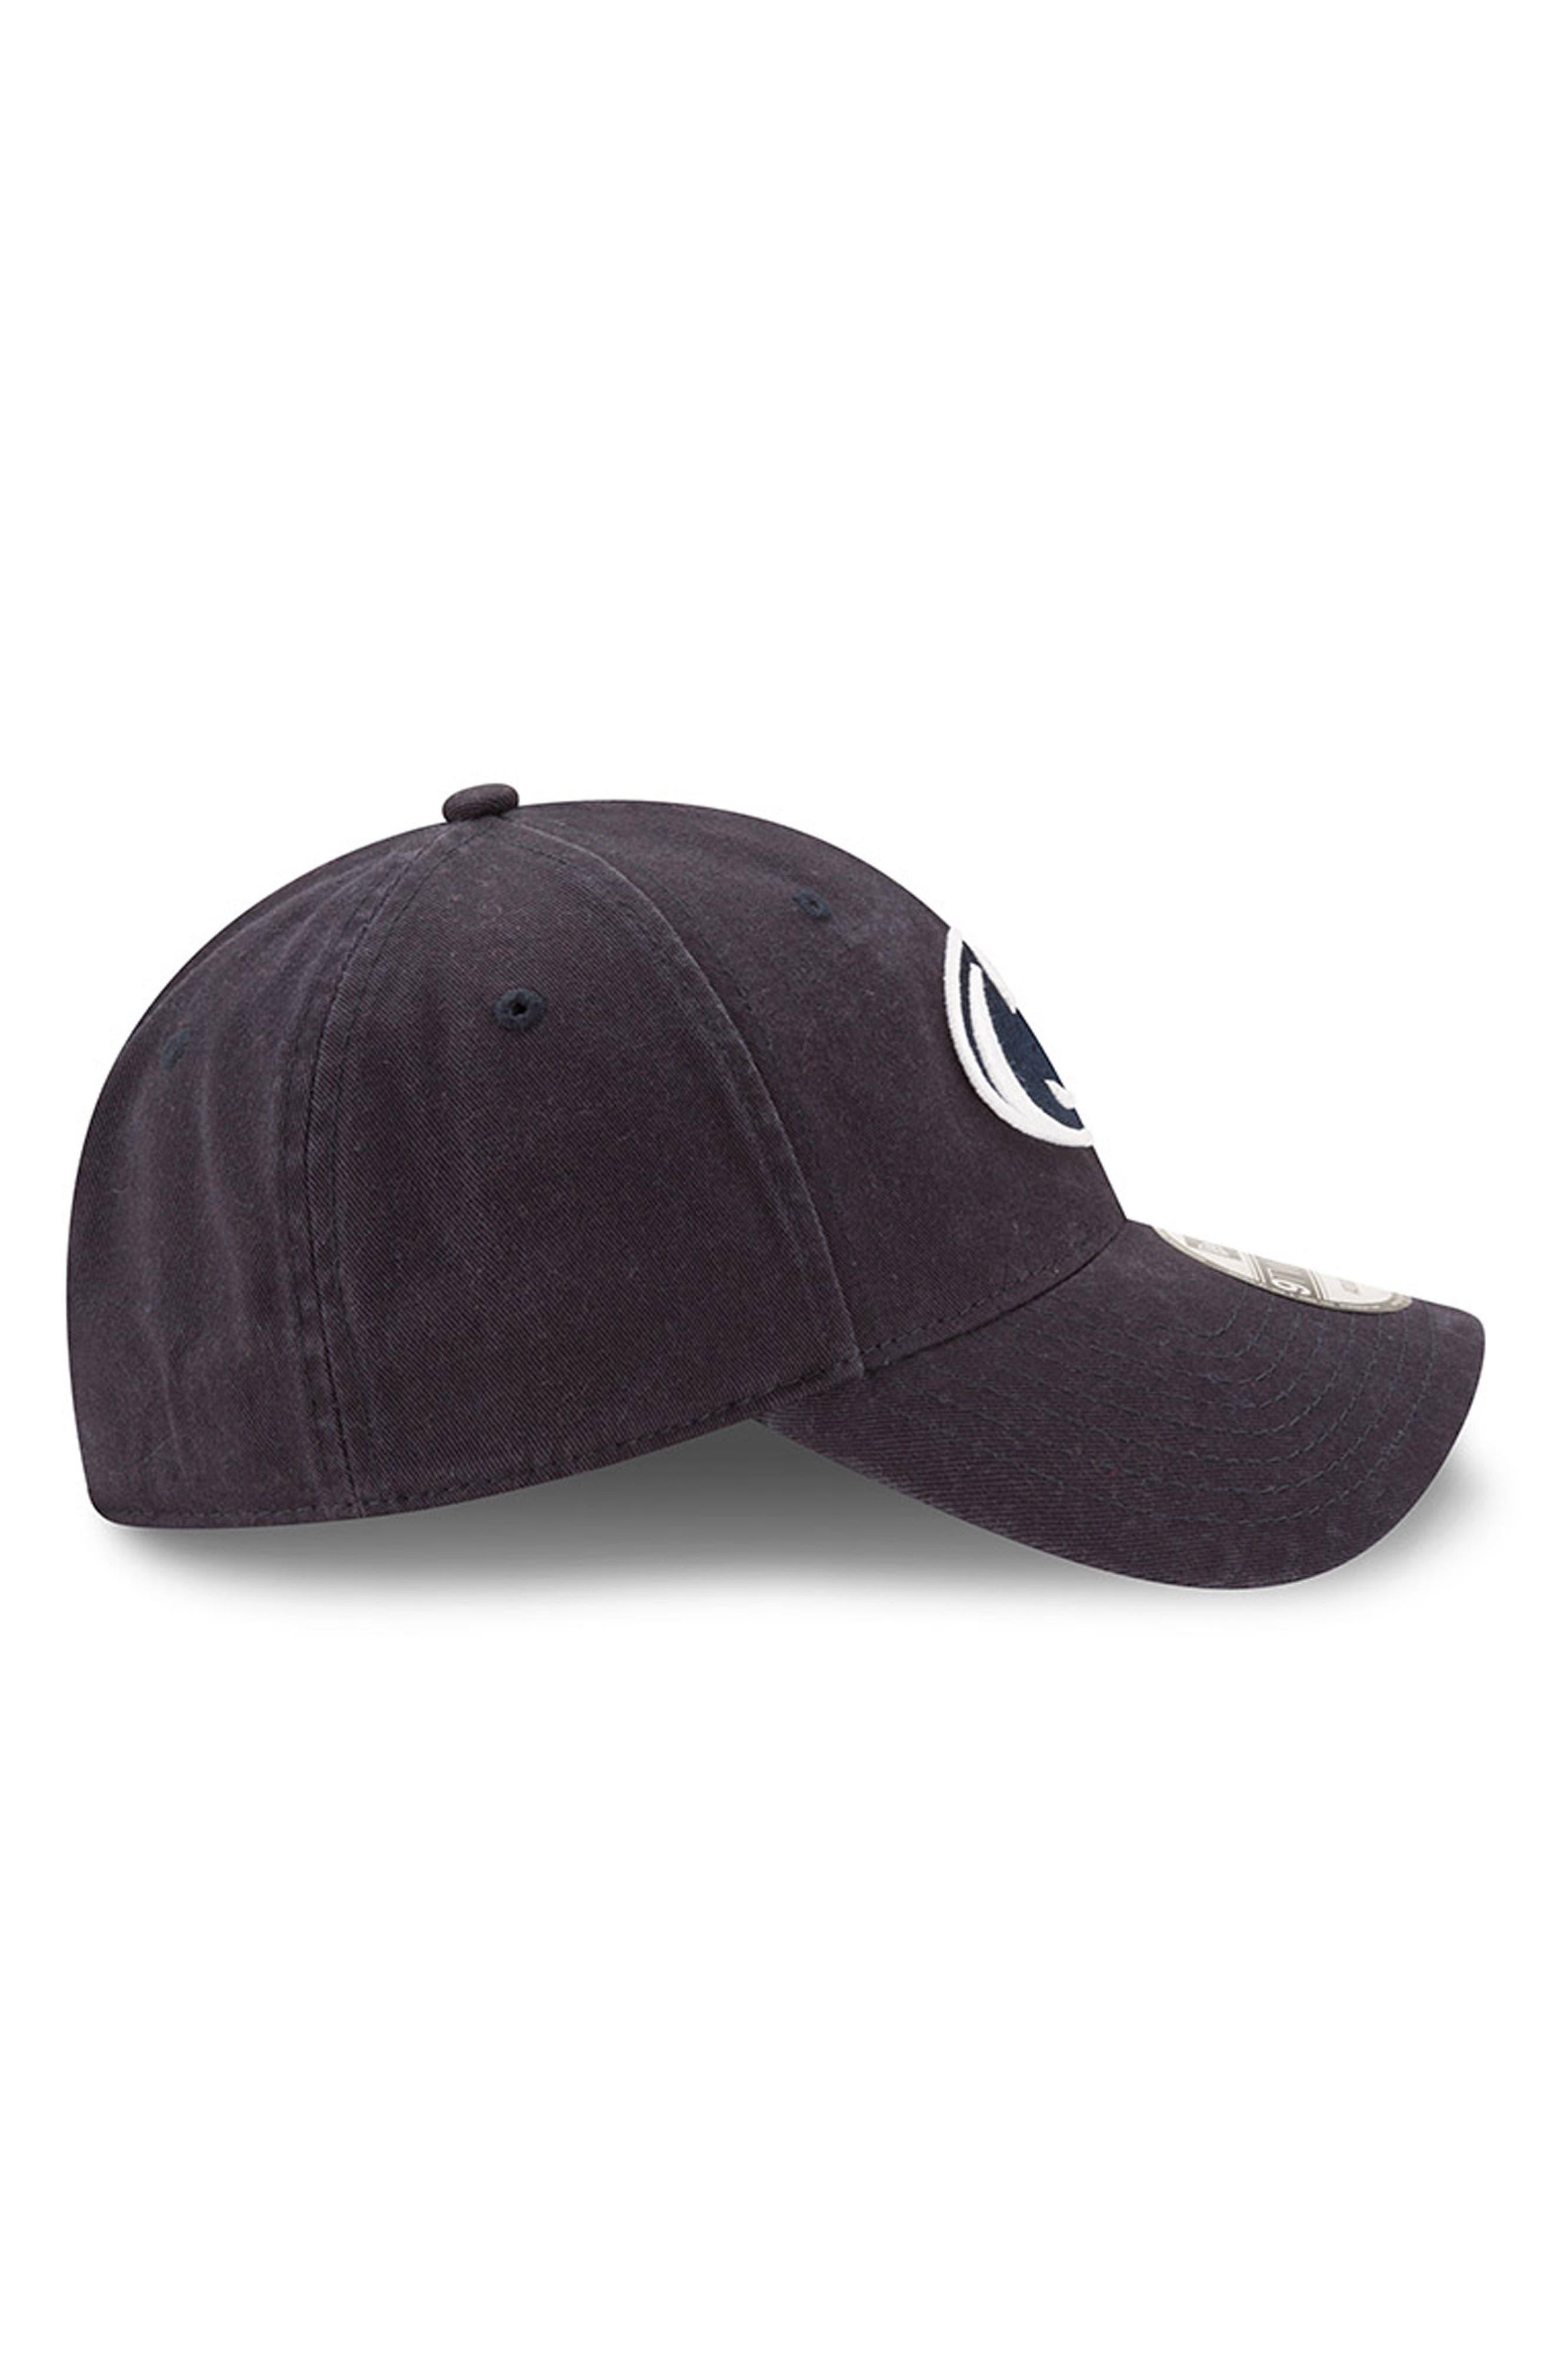 New Era Collegiate Core Classic - Penn State Nittany Lions Baseball Cap,                             Alternate thumbnail 4, color,